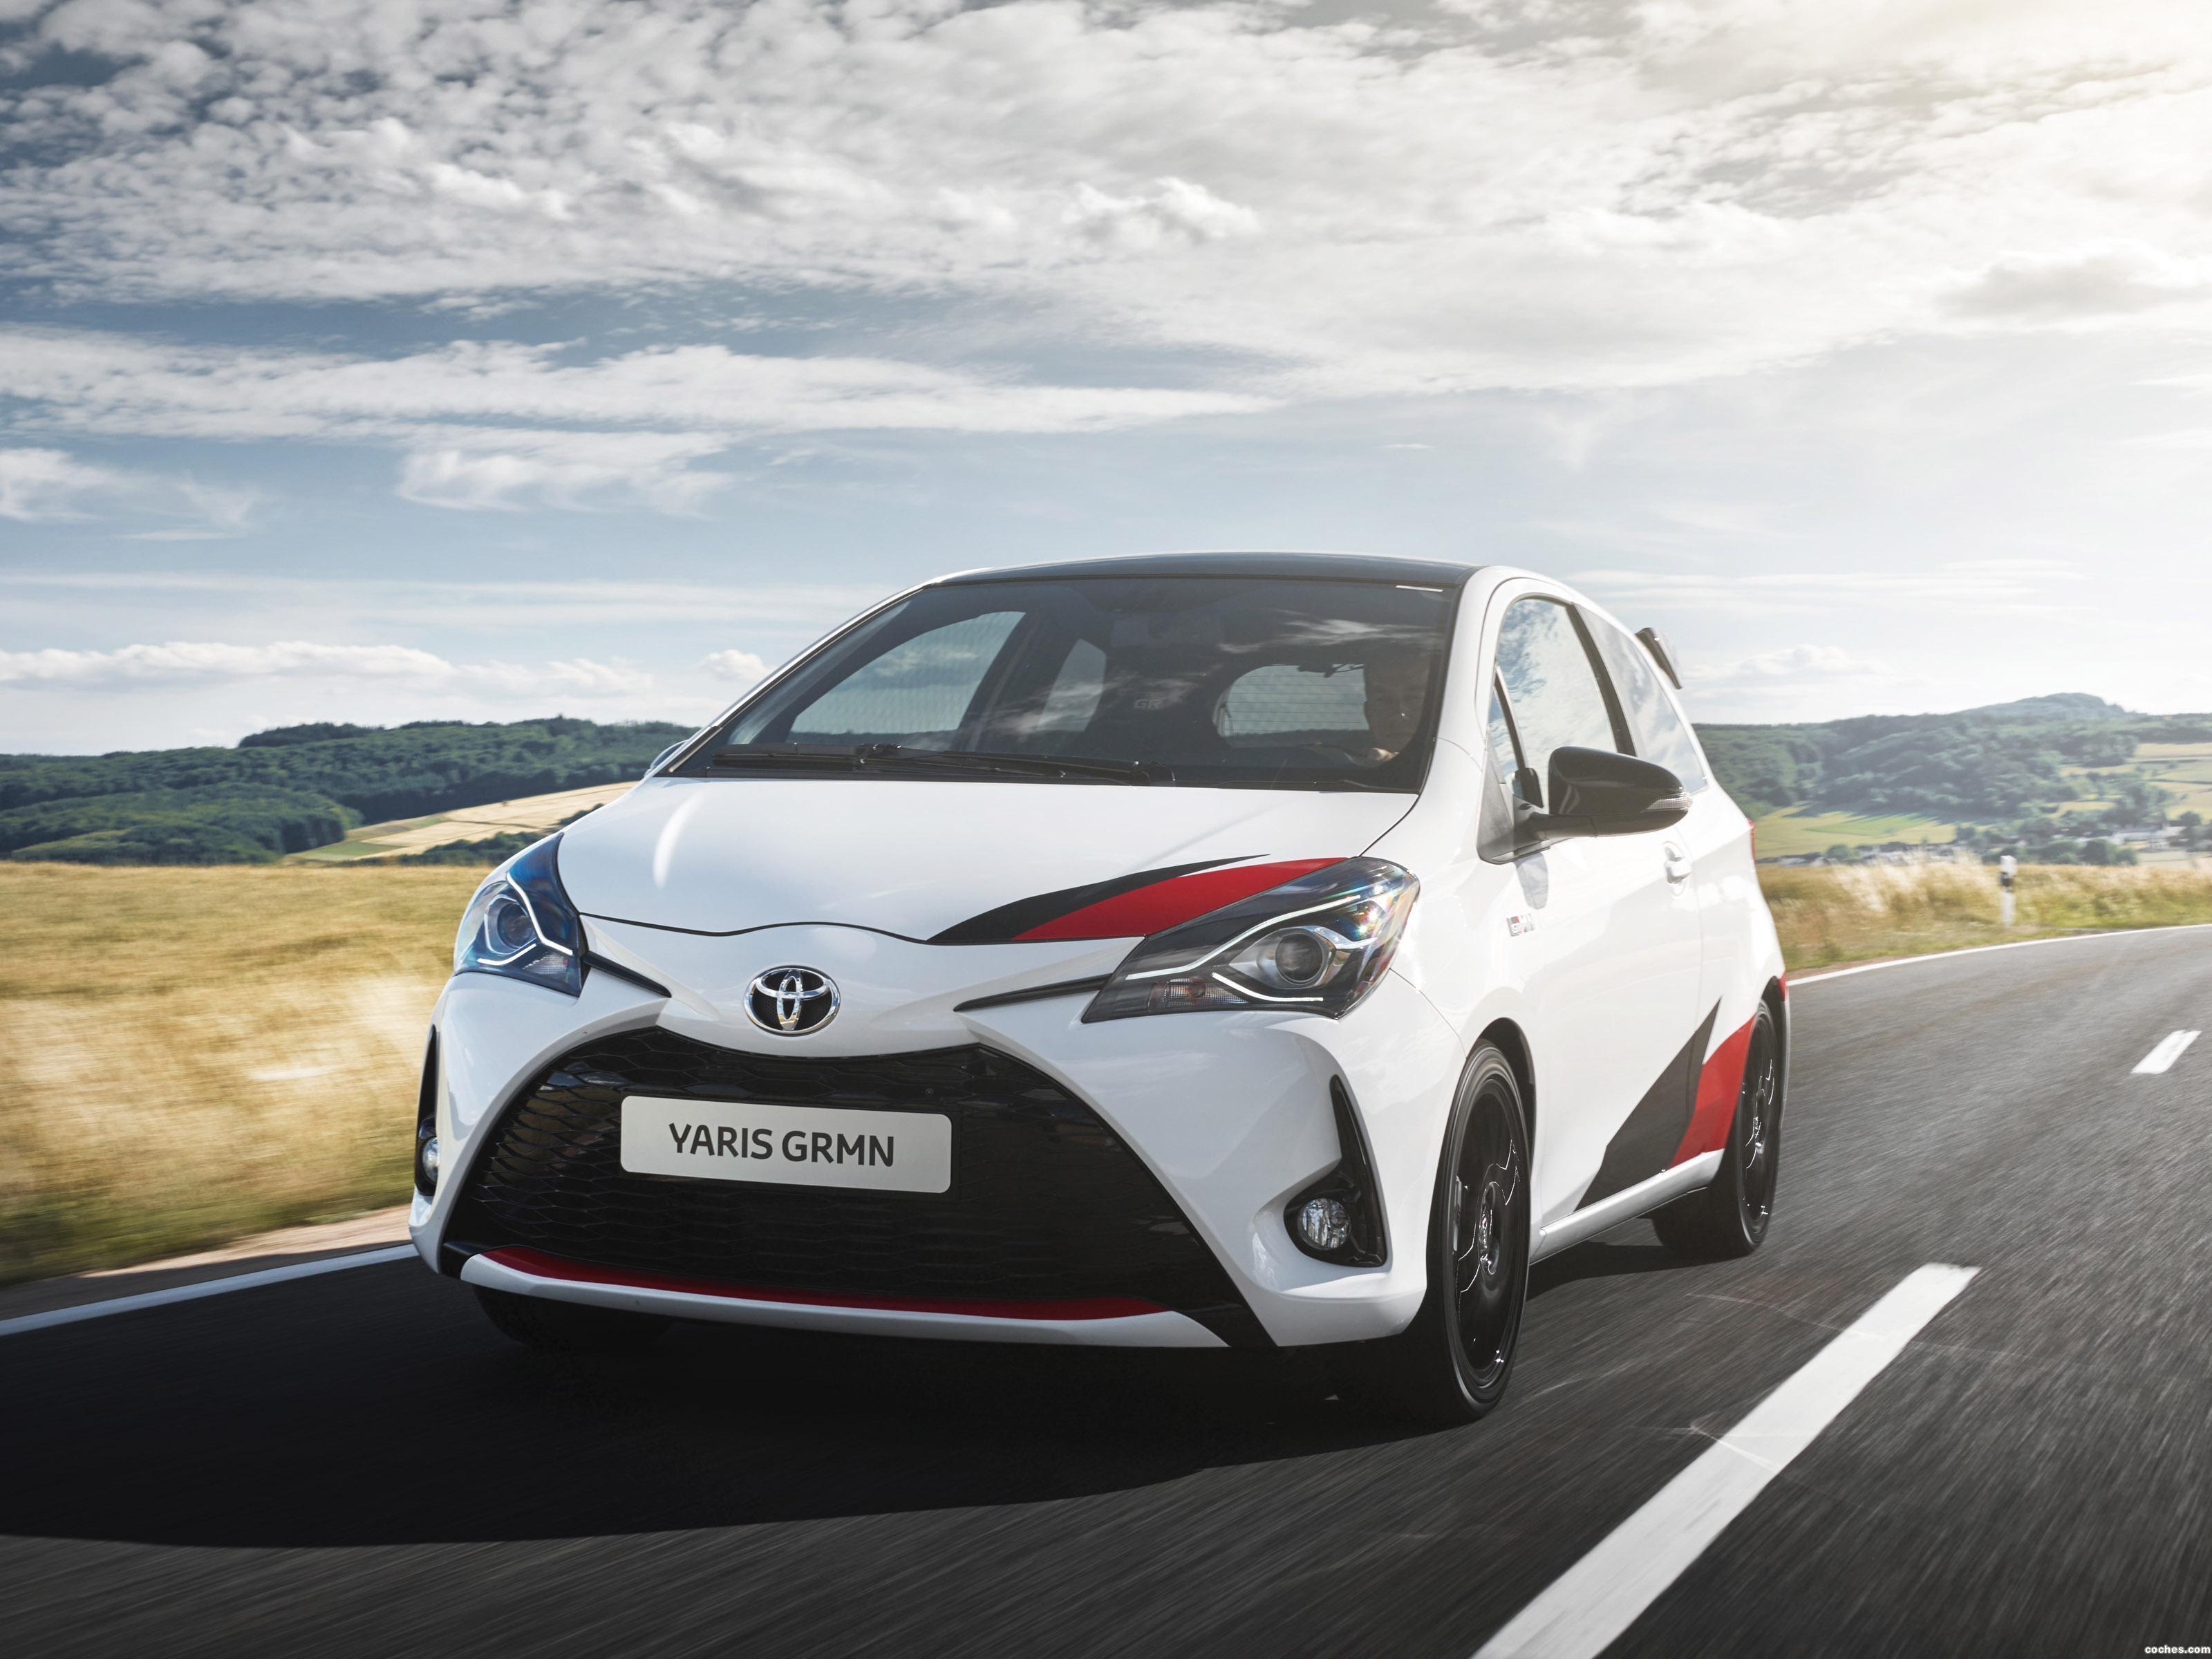 Fotos de Toyota Yaris GRMN 2017